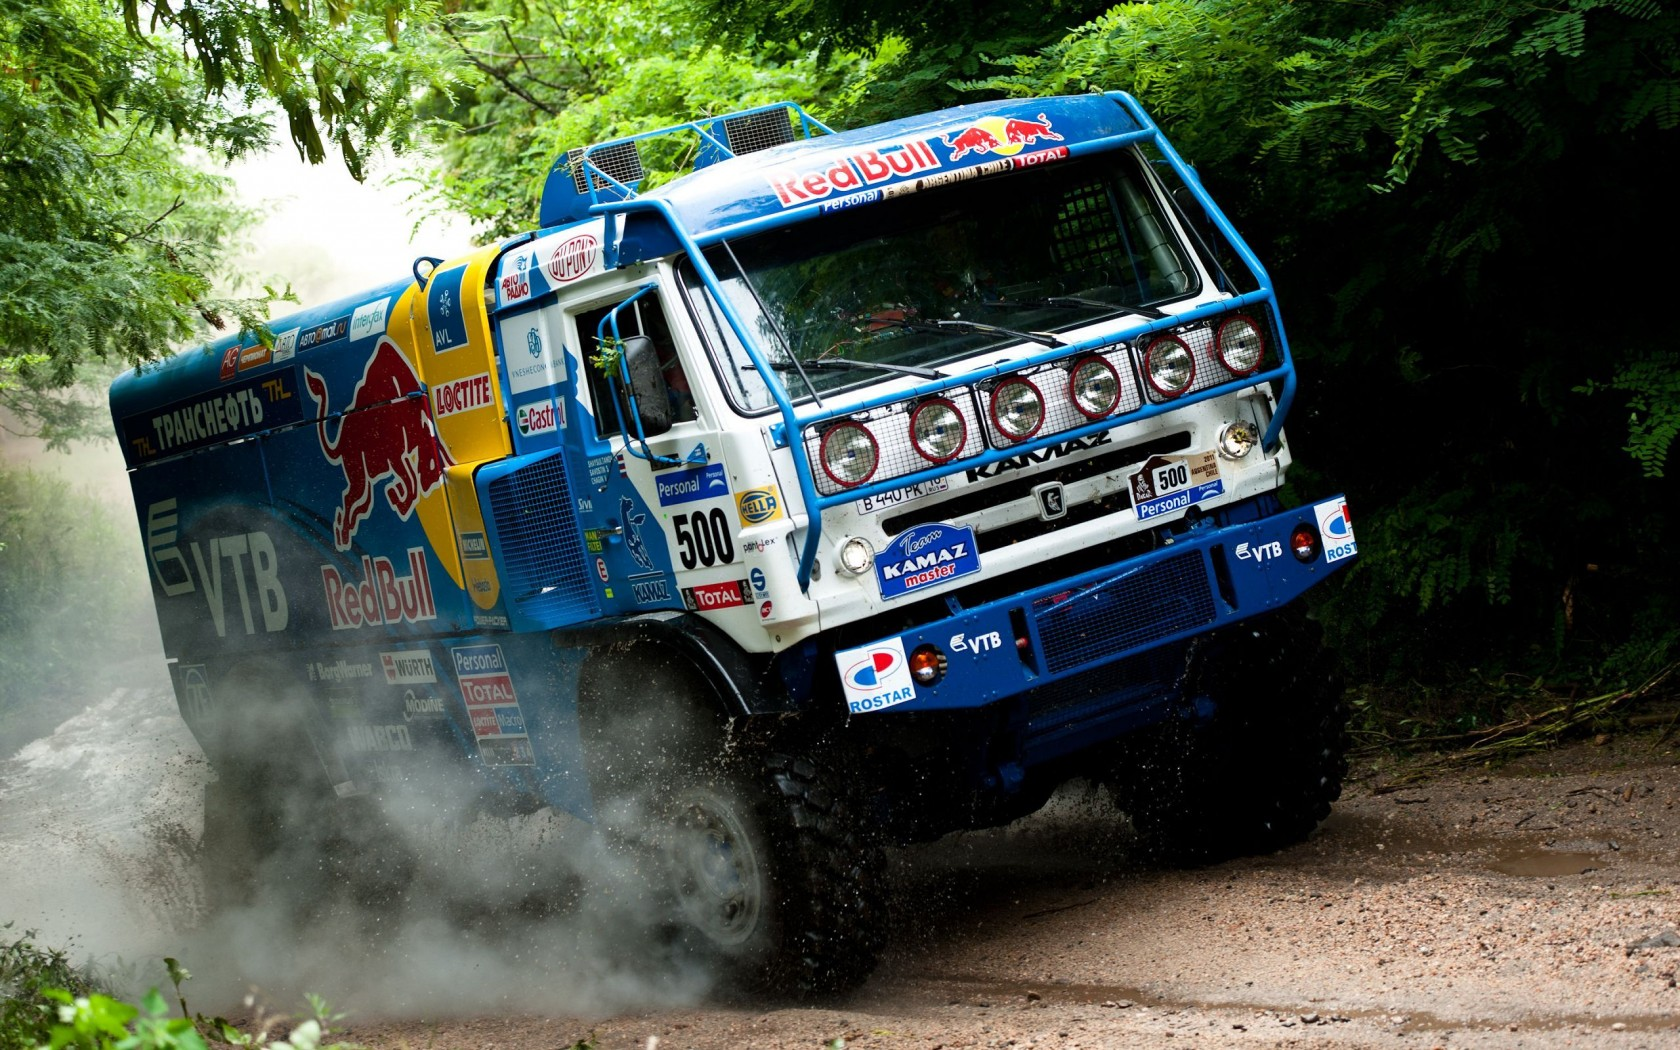 Kamaz-Truck-Blue-1050x1680.jpg